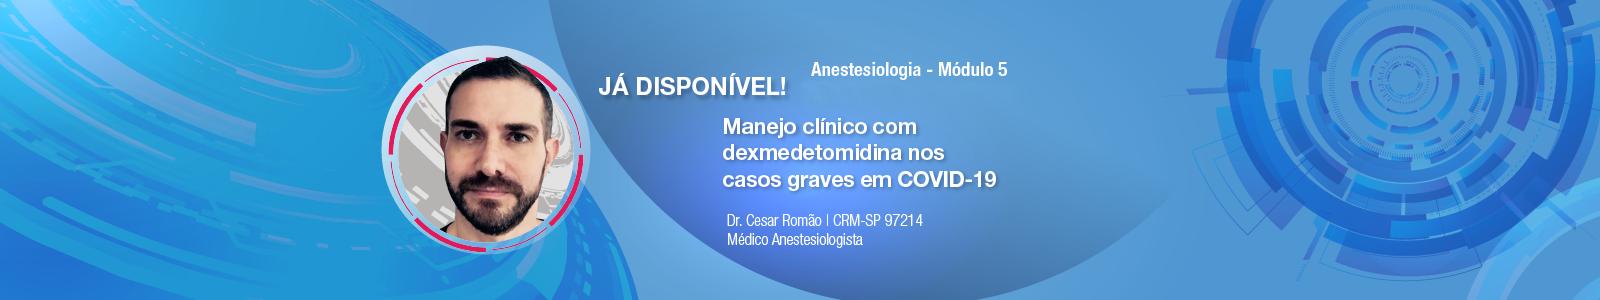 Visão Aché2021-banners anestesiologia-5 3